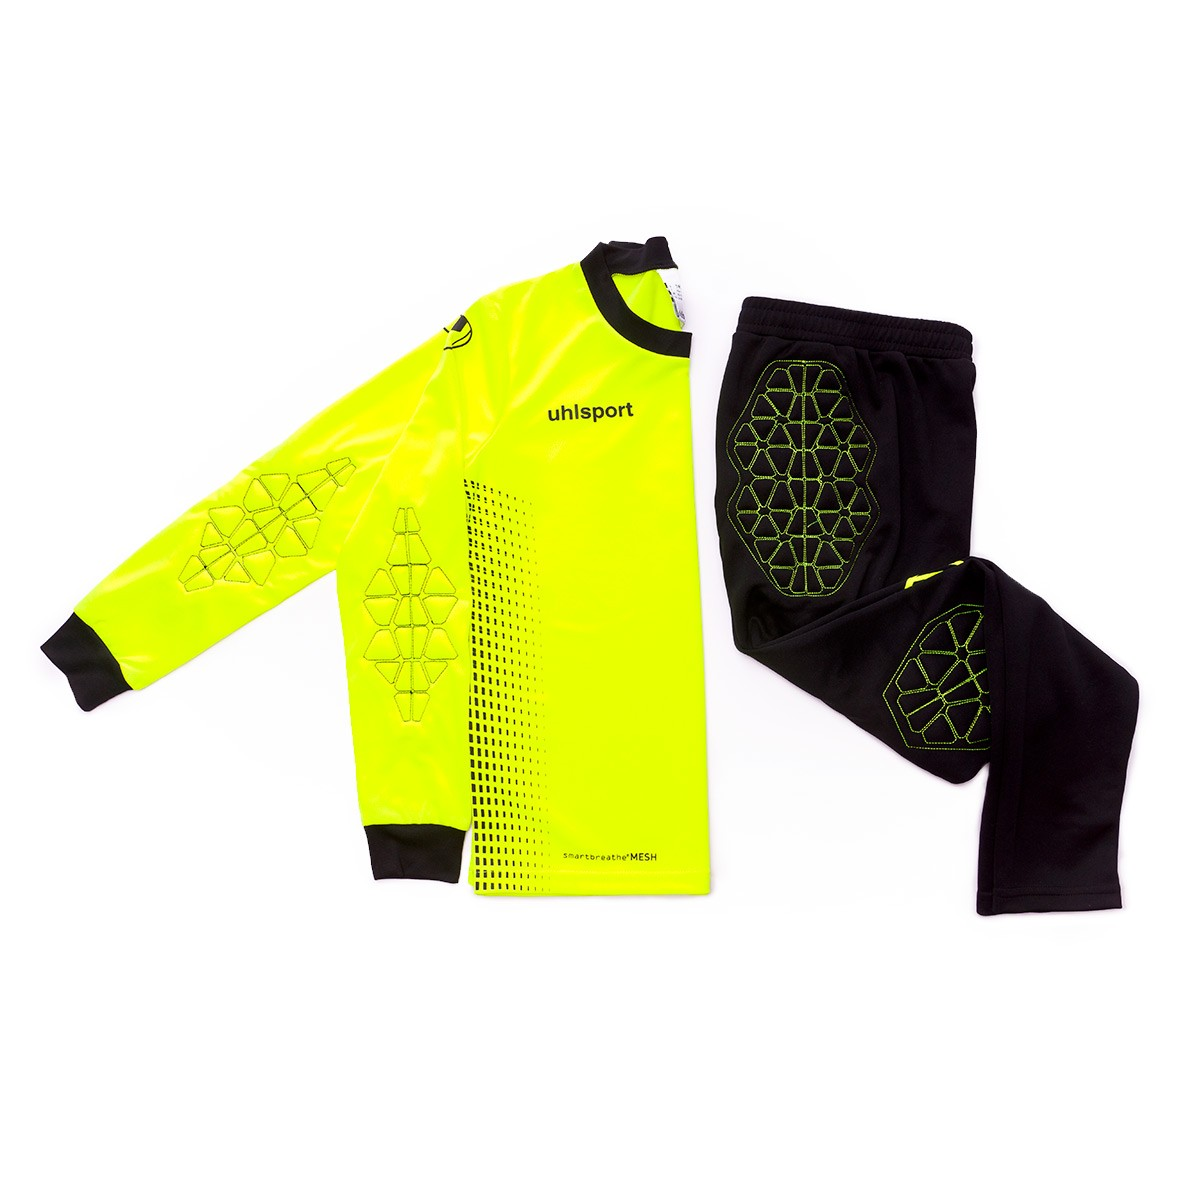 e0468fdc4 Kit Uhlsport Kids Goalkeeper Set Fluor yellow-Black - Tienda de fútbol  Fútbol Emotion